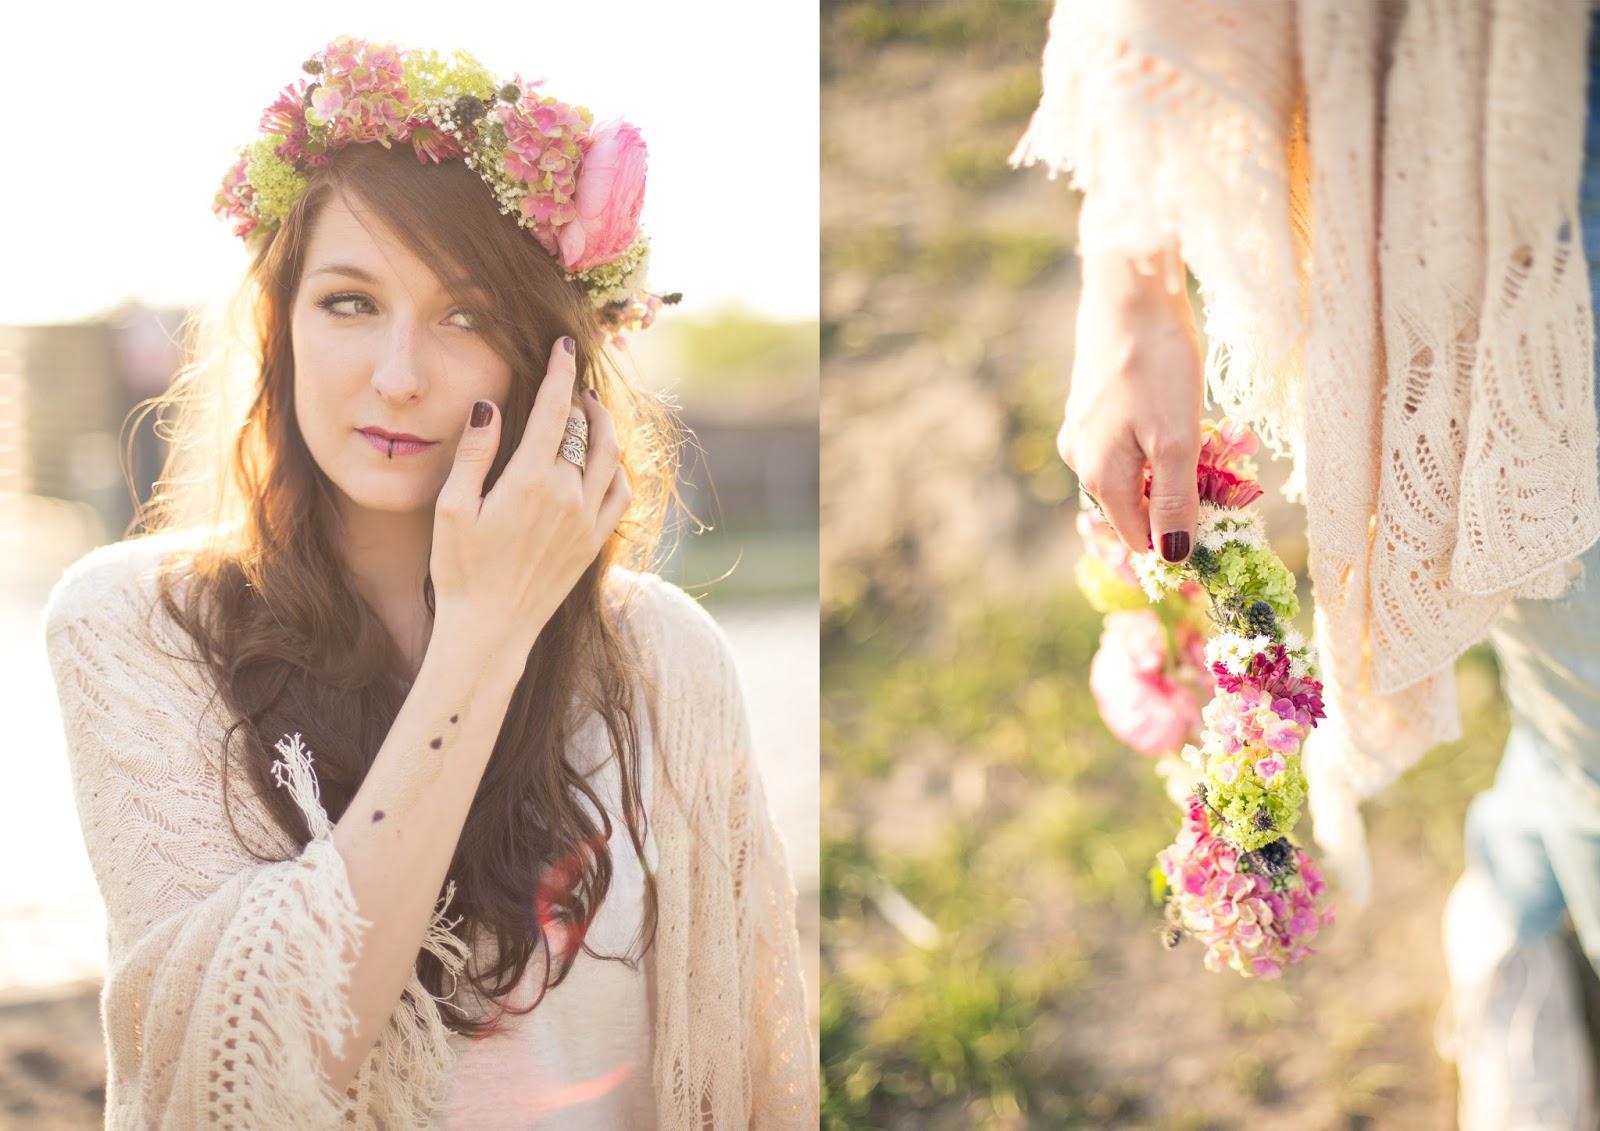 Blumenkranz Flower Crown DIY Festival Outfit